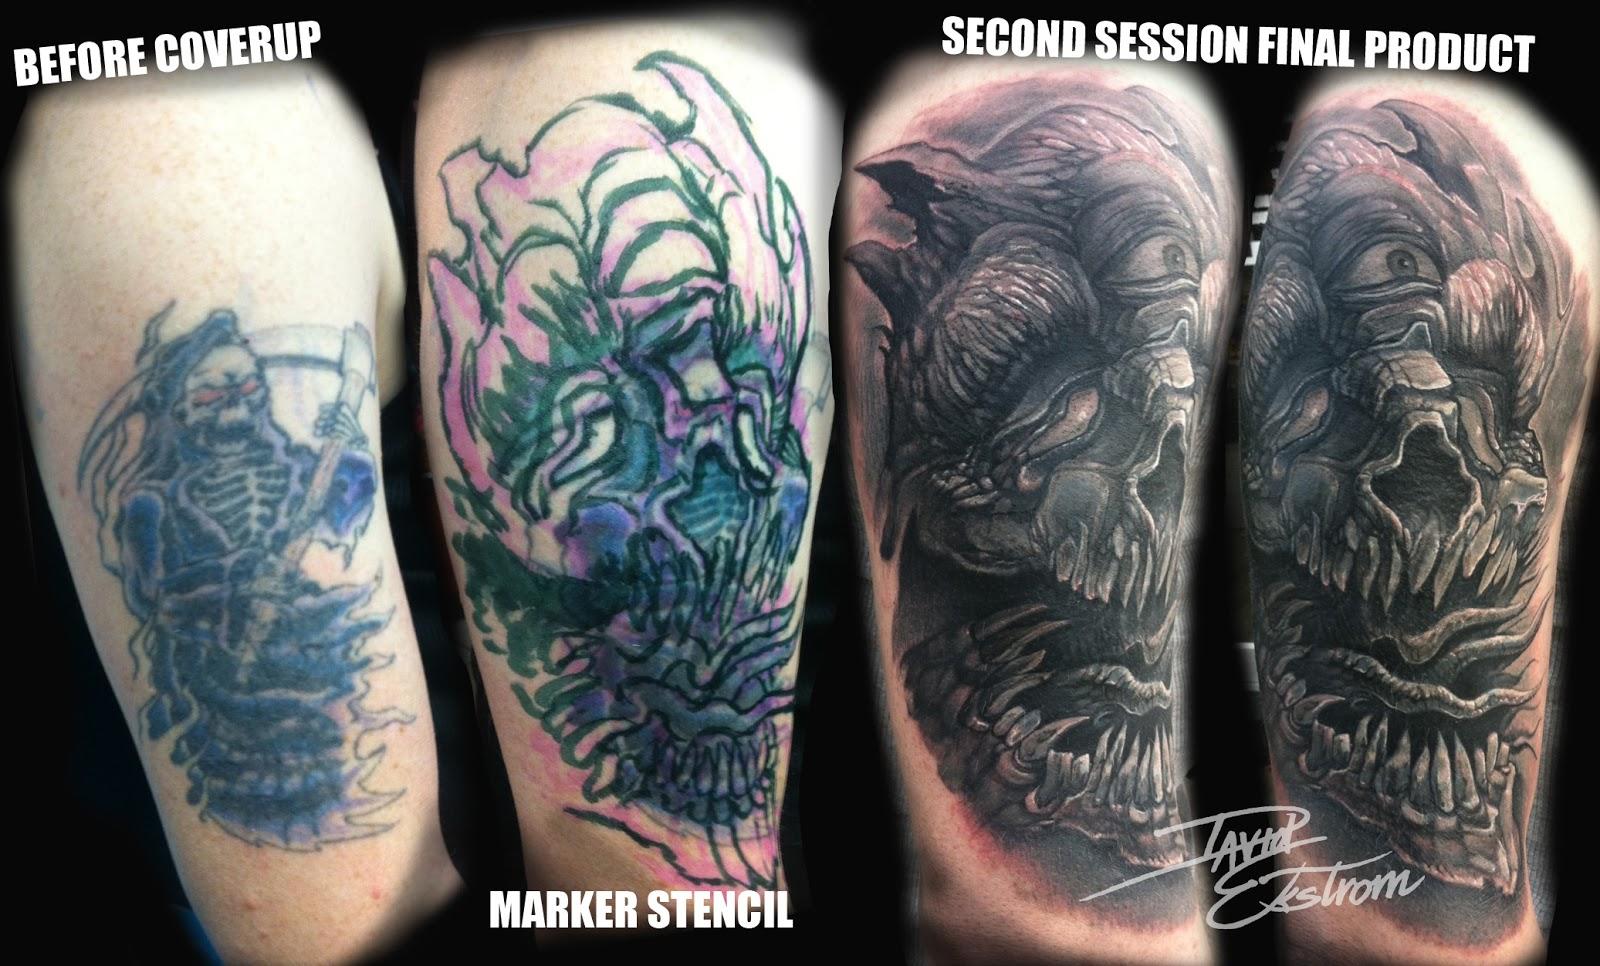 Cover Up Tattoos For Men: Tattoos & Art By: DAVID EKSTROM: November 2012